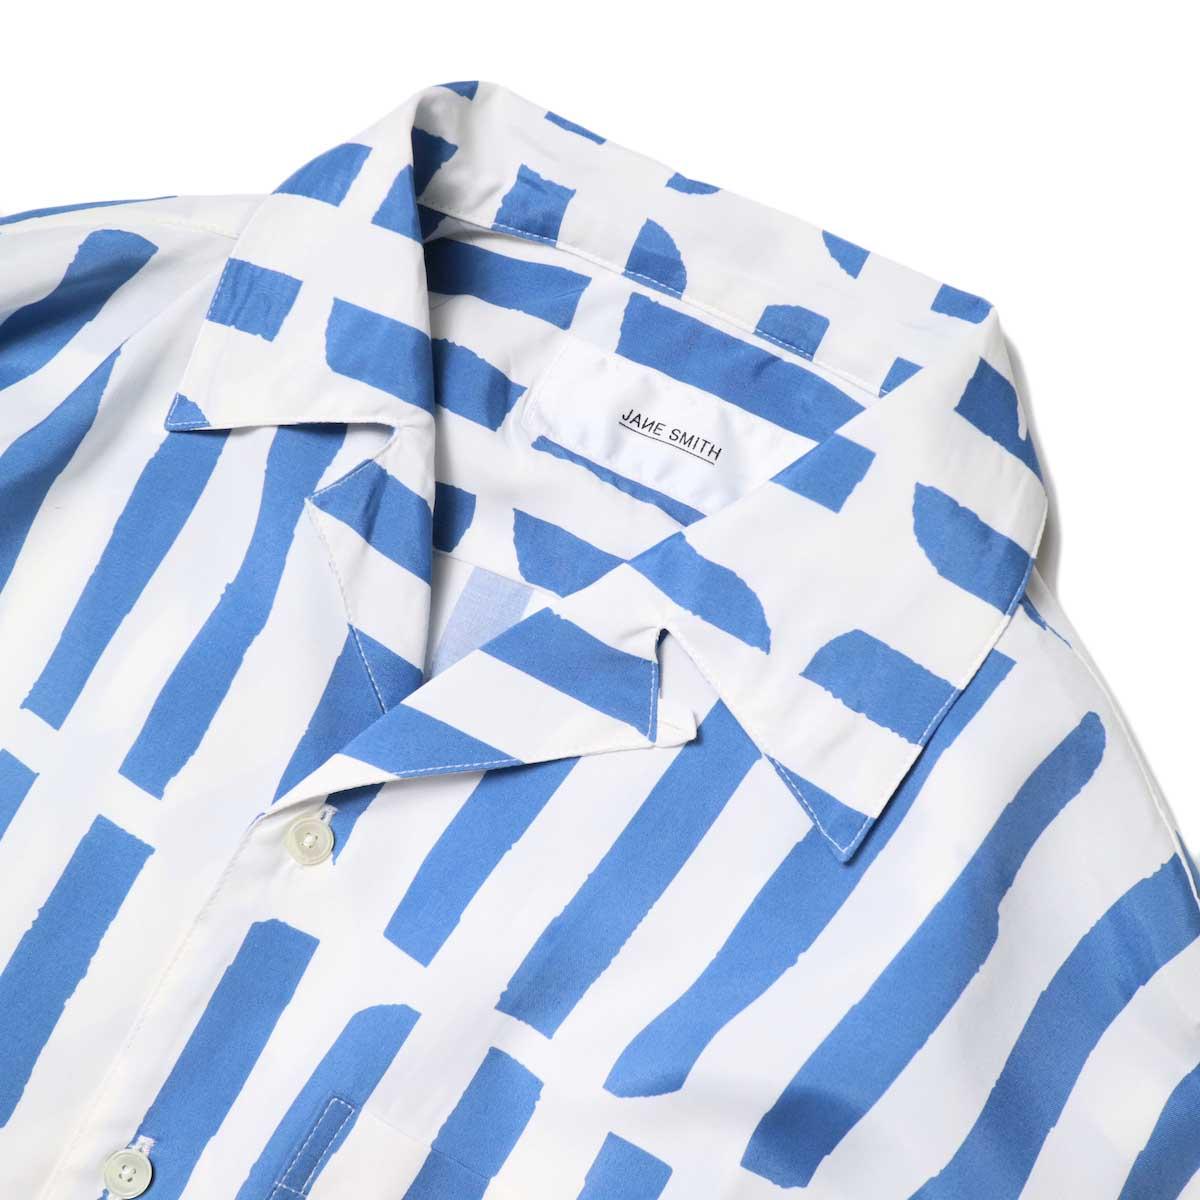 JANE SMITH / OPEN COLLAR SHIRTS S/S (White Blue) フロントアップ